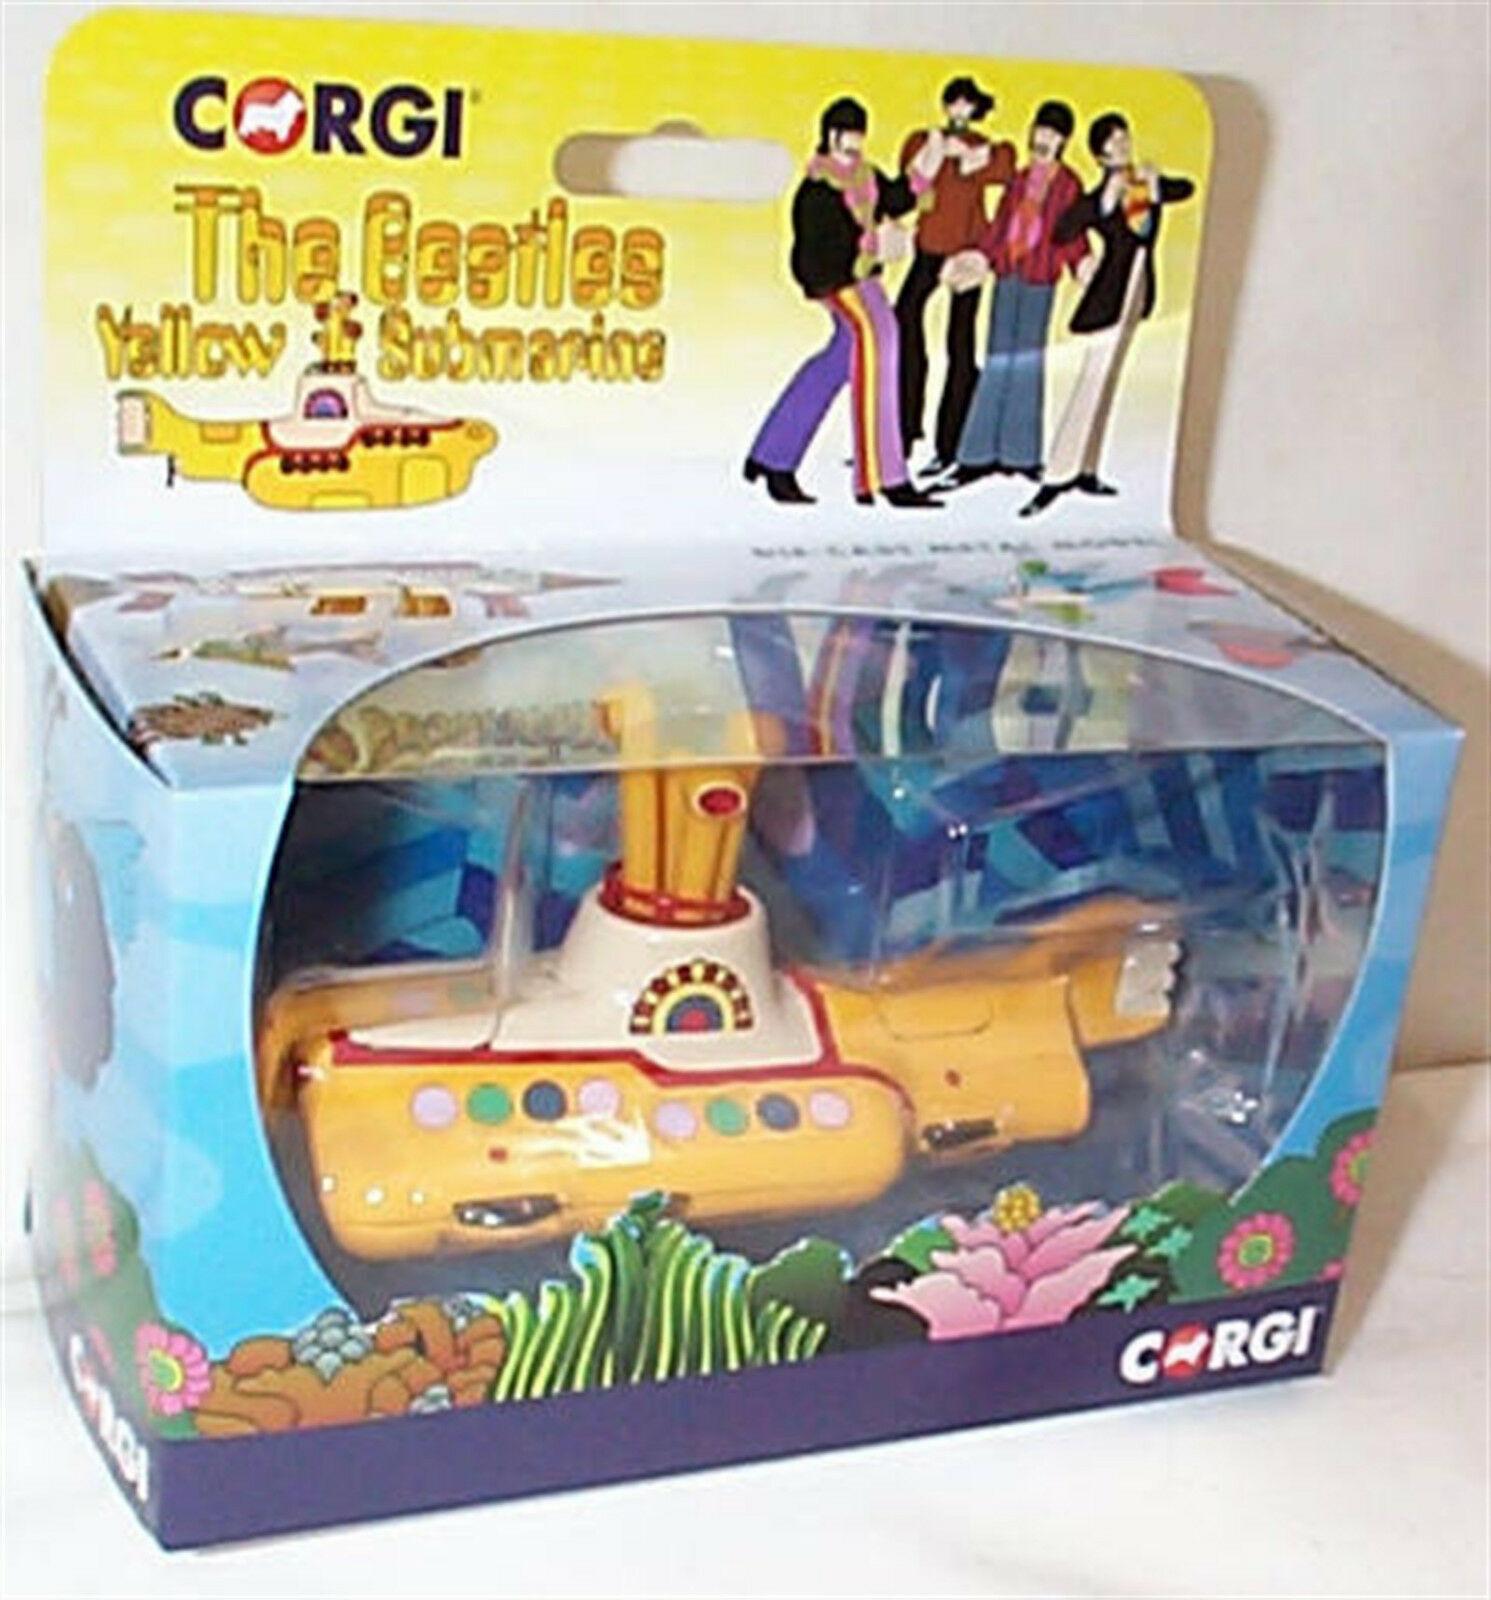 CORGI YELLOW SUBMARINE Diecast Model Toy The Beatles Brand New Boxed CC05401 50t